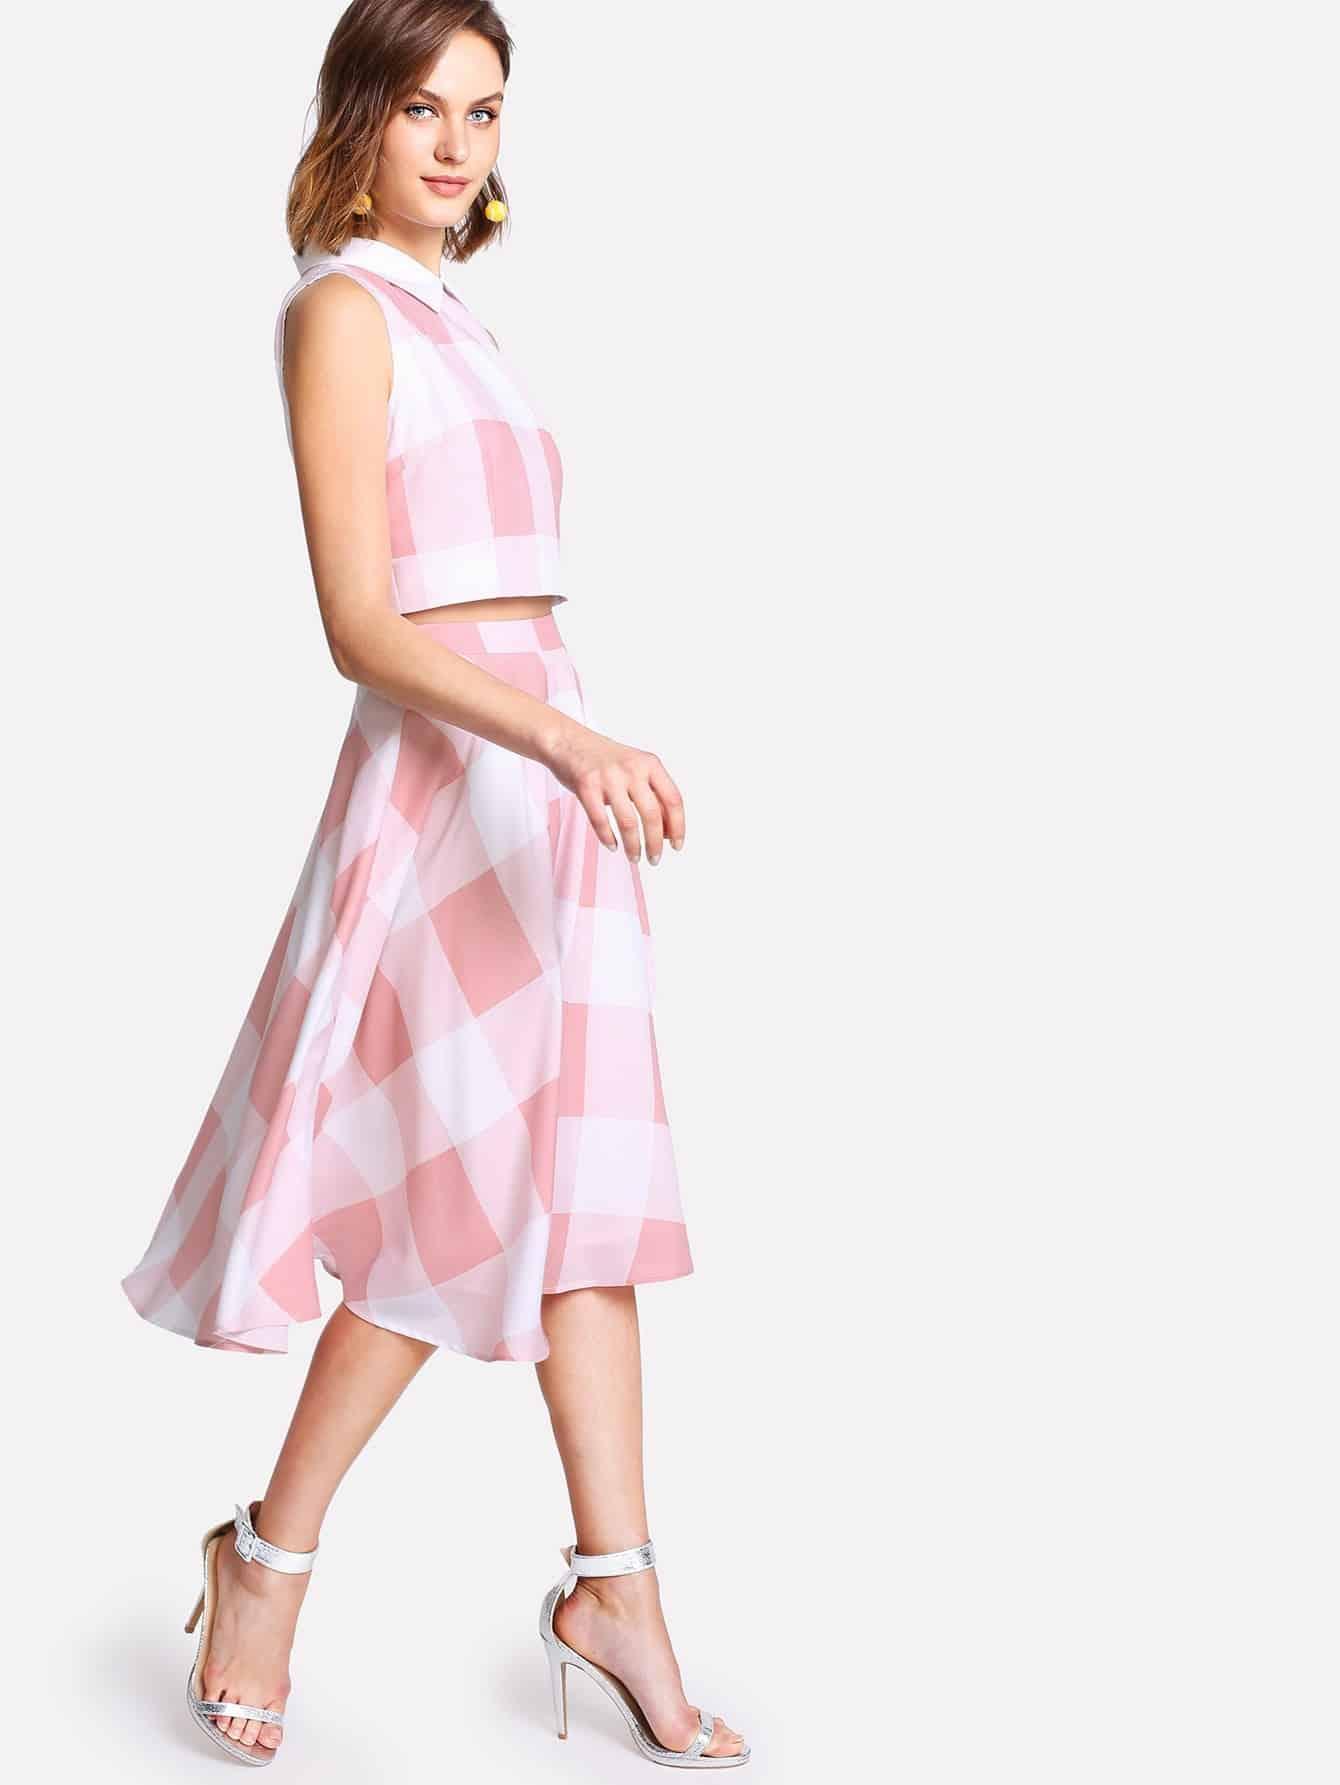 Zip Back Plaid Crop Top And Skirt Set джеймс эшер bhakta ranga rasa india новый взгляд mp3